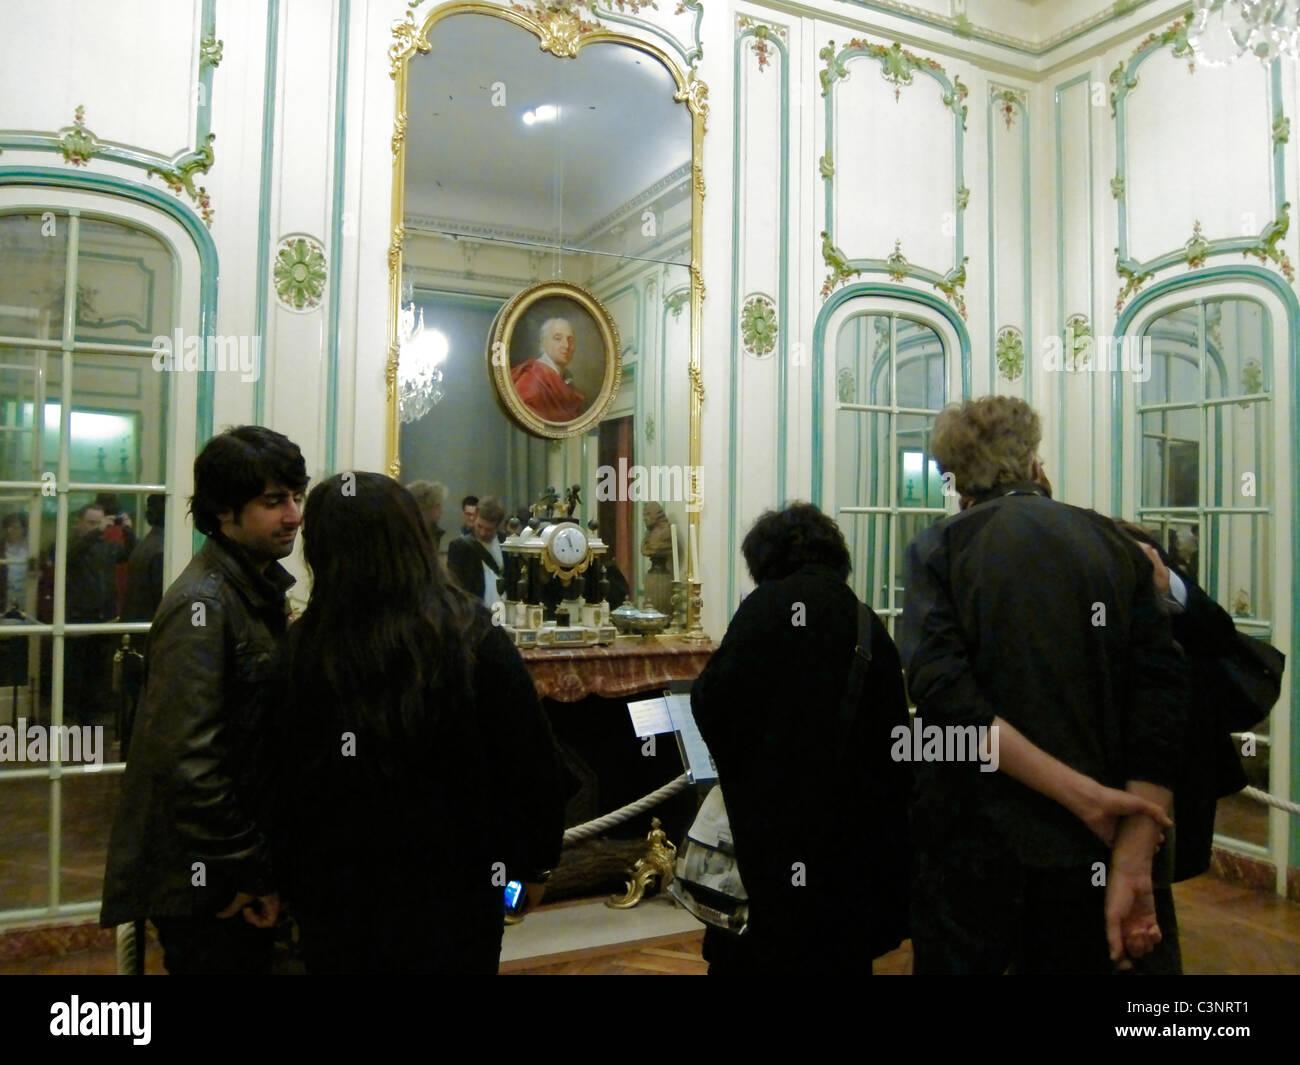 Paris, France, People Visiting 'Musee Carnavalet',' Musee de l'Histoire', City of Paris Museum, - Stock Image